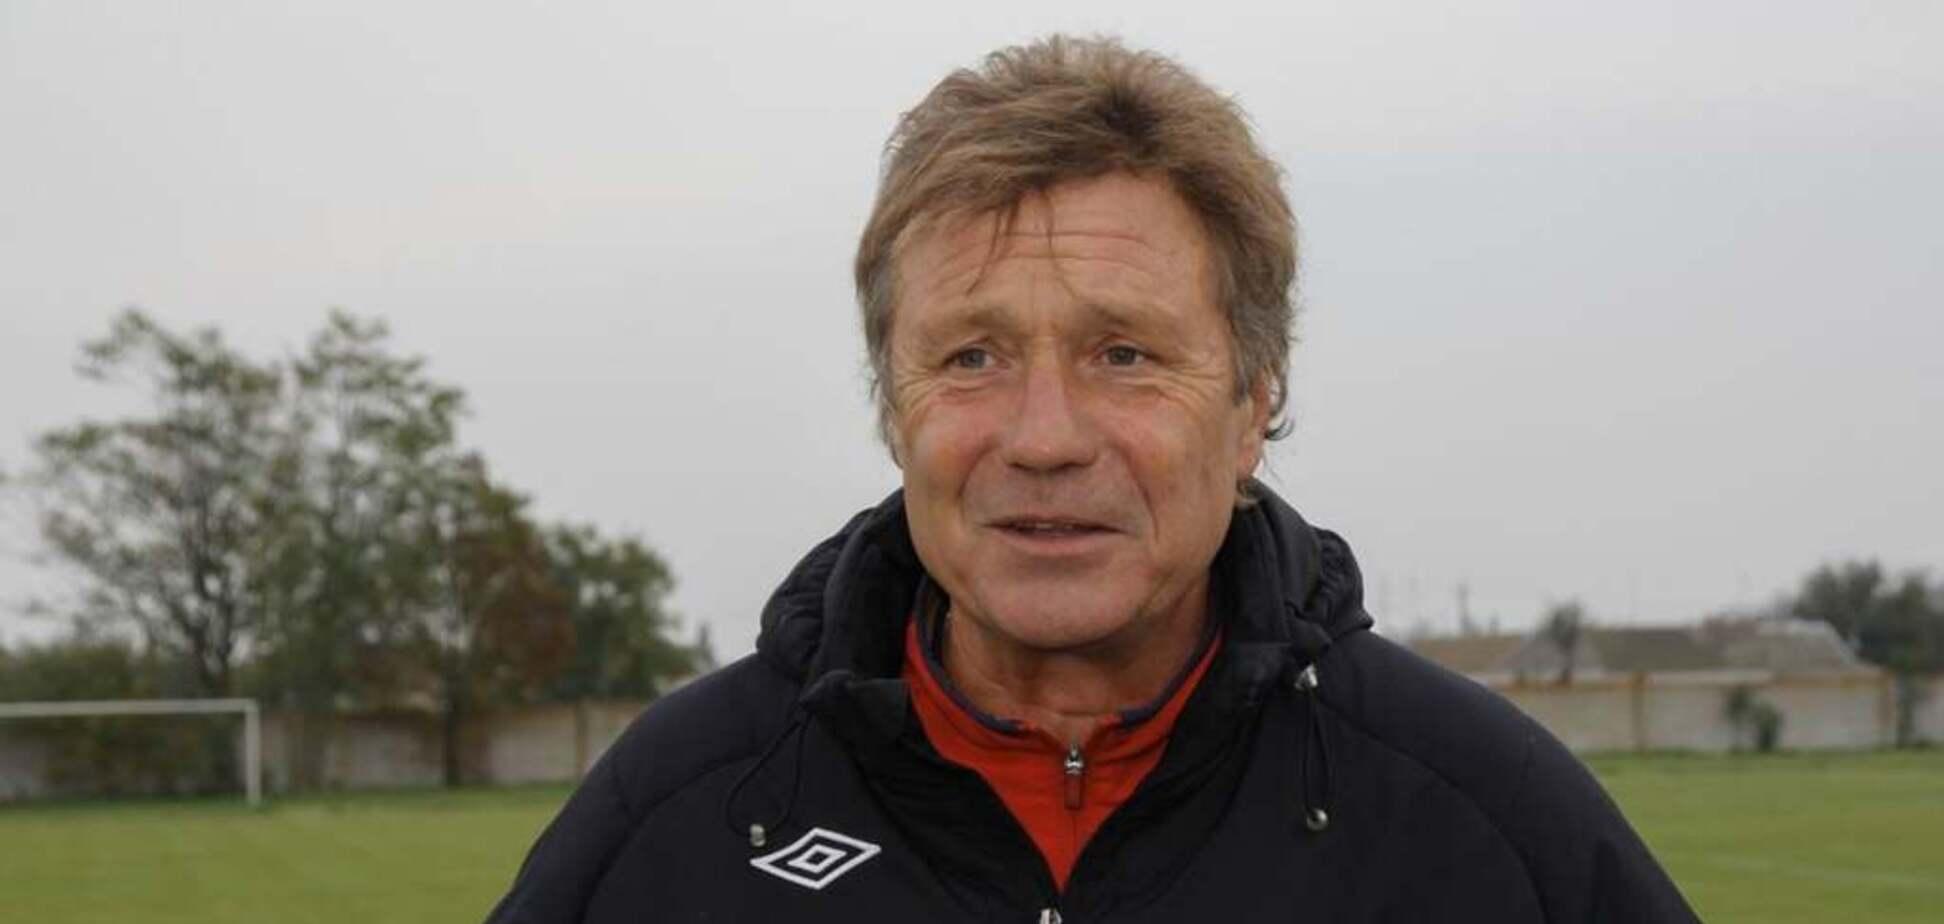 'Ну як?' Тренер легендарного футбольного клубу звернувся до Зеленського